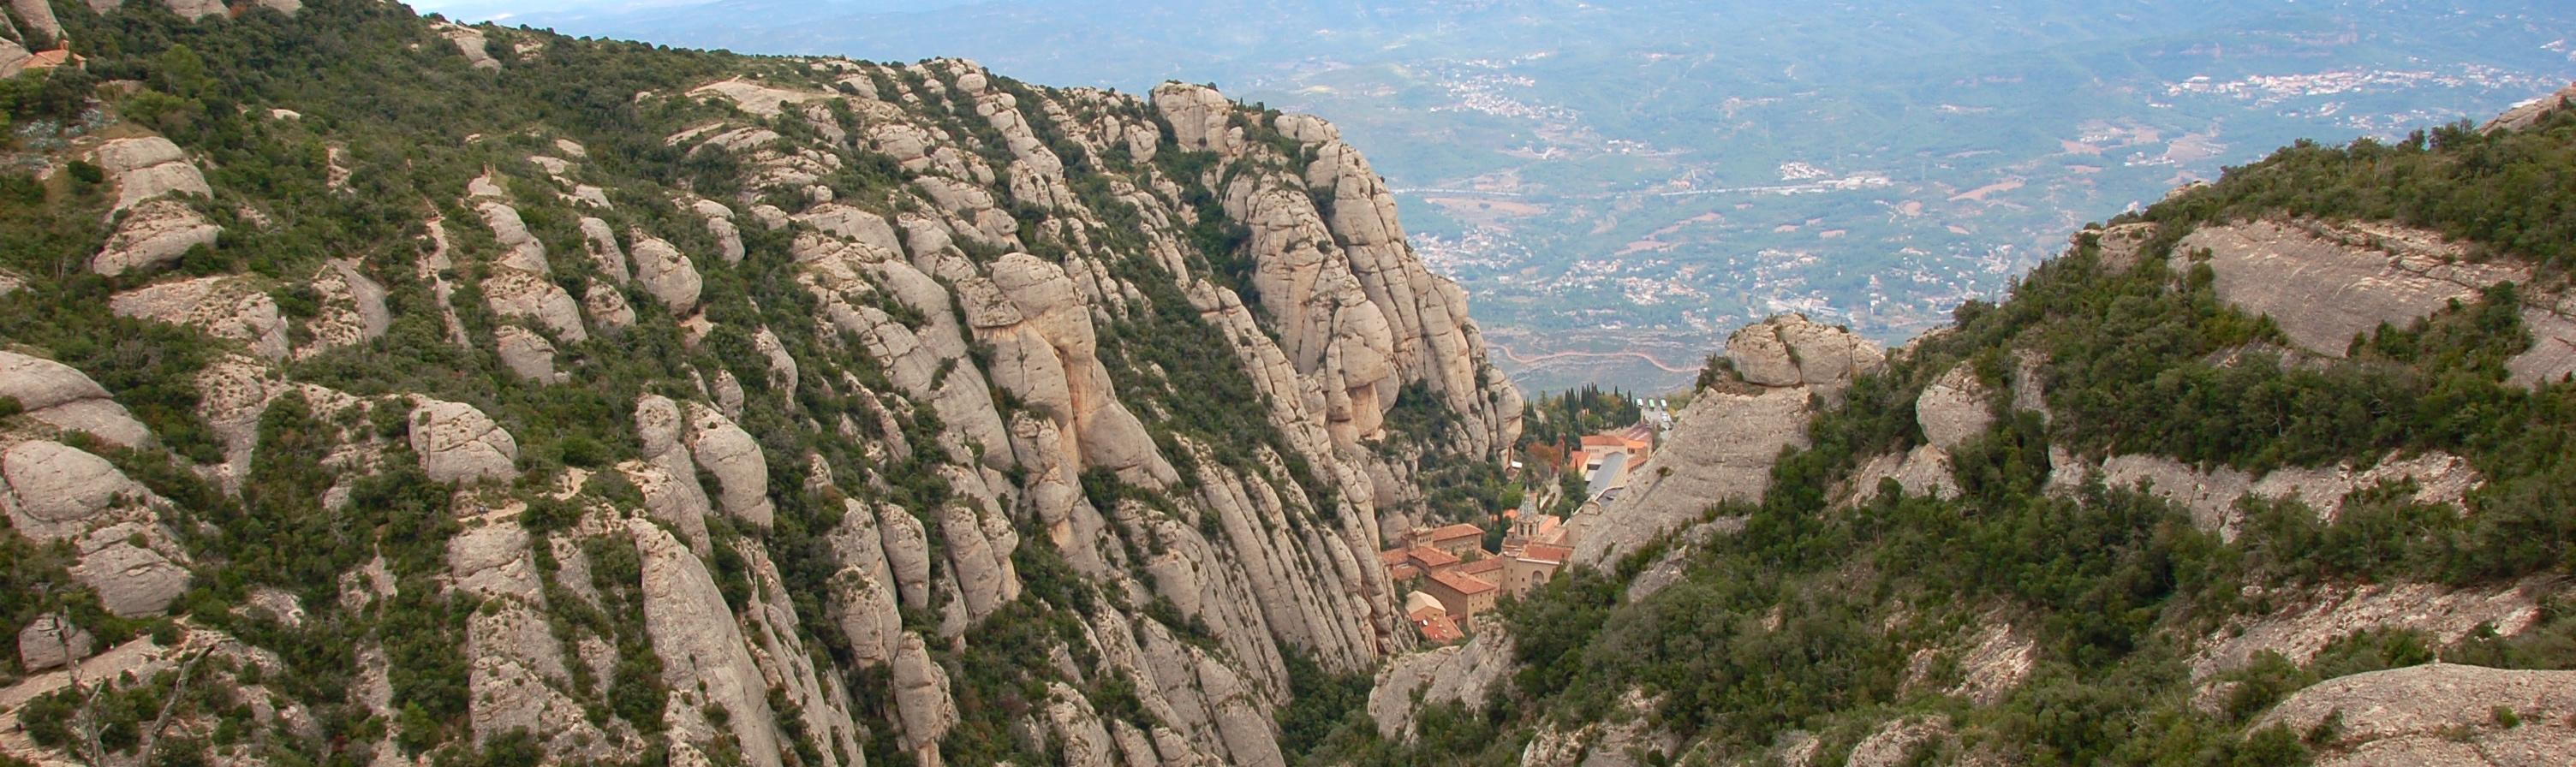 Cima Montserrat